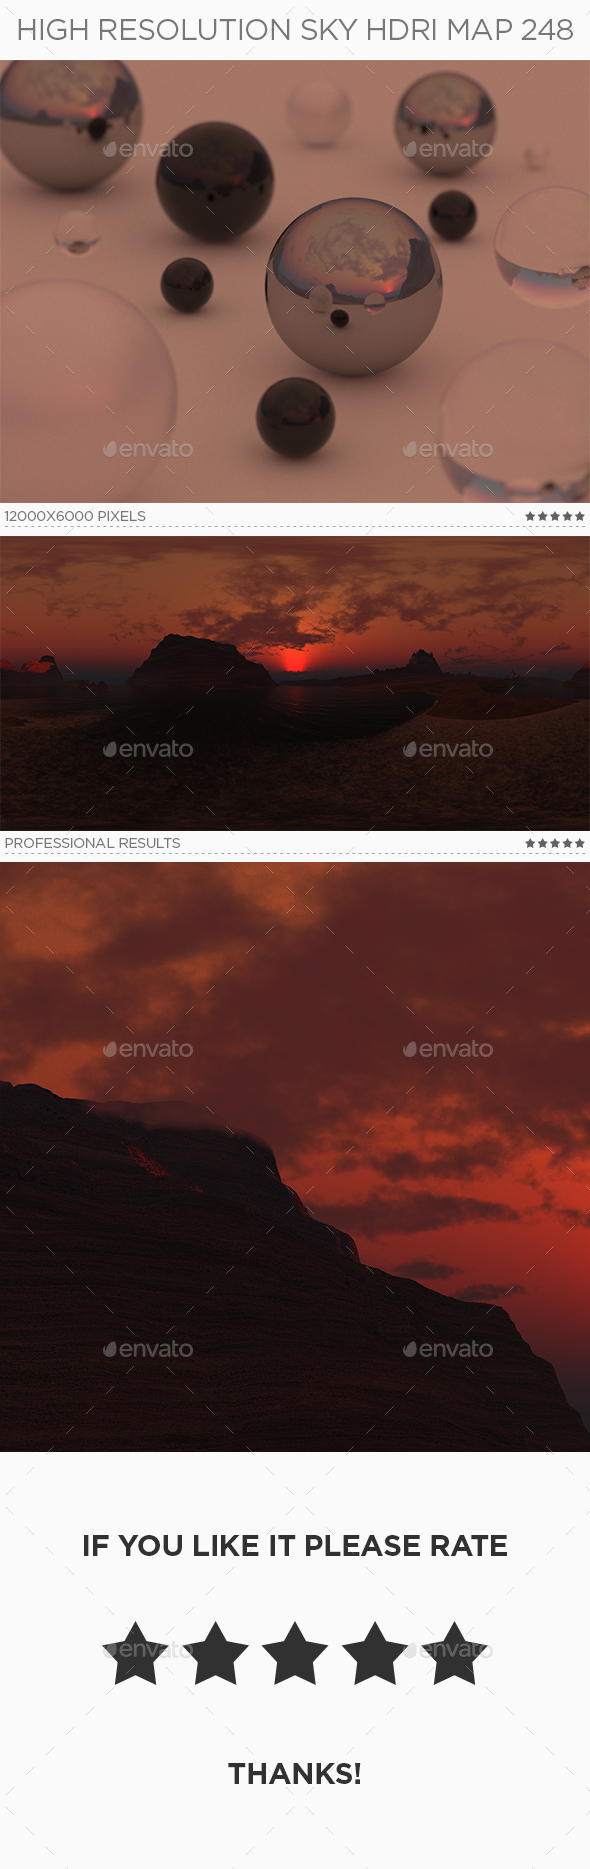 High Resolution Sky HDRi Map 248 - 3DOcean Item for Sale